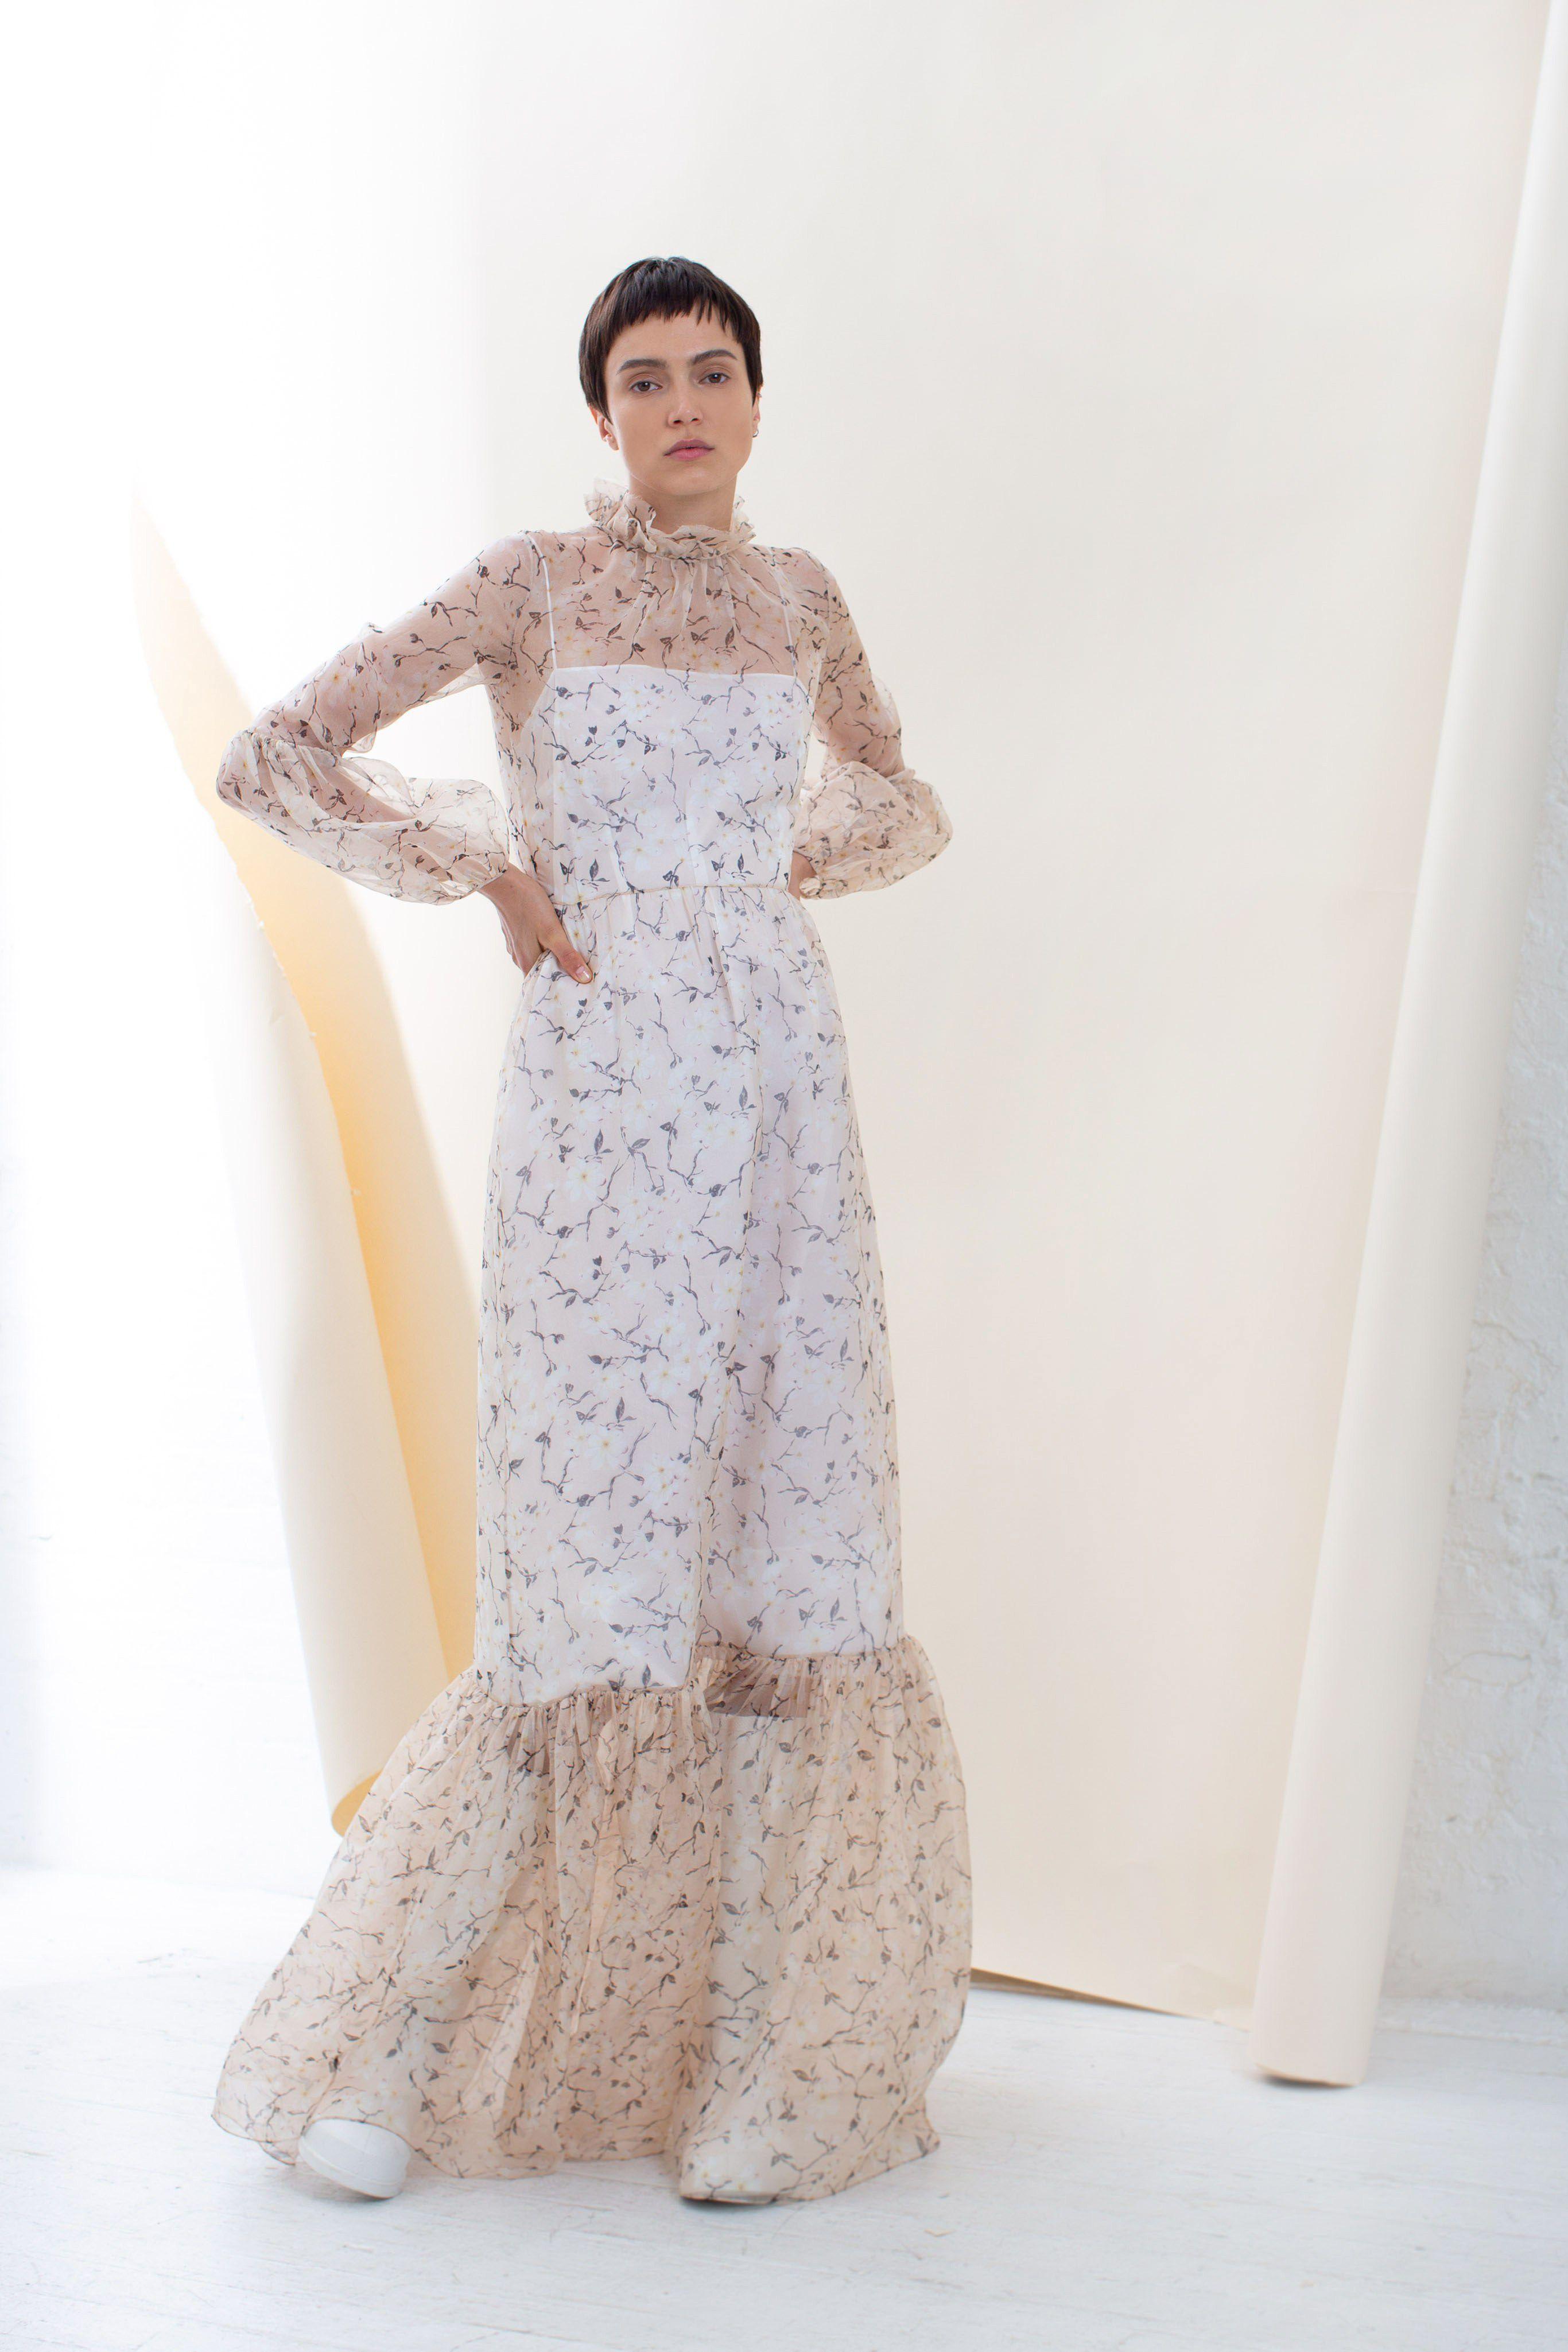 190a2b1d8bebe Beach Wedding Dresses - Bridal Gowns for a Beach Destination Wedding